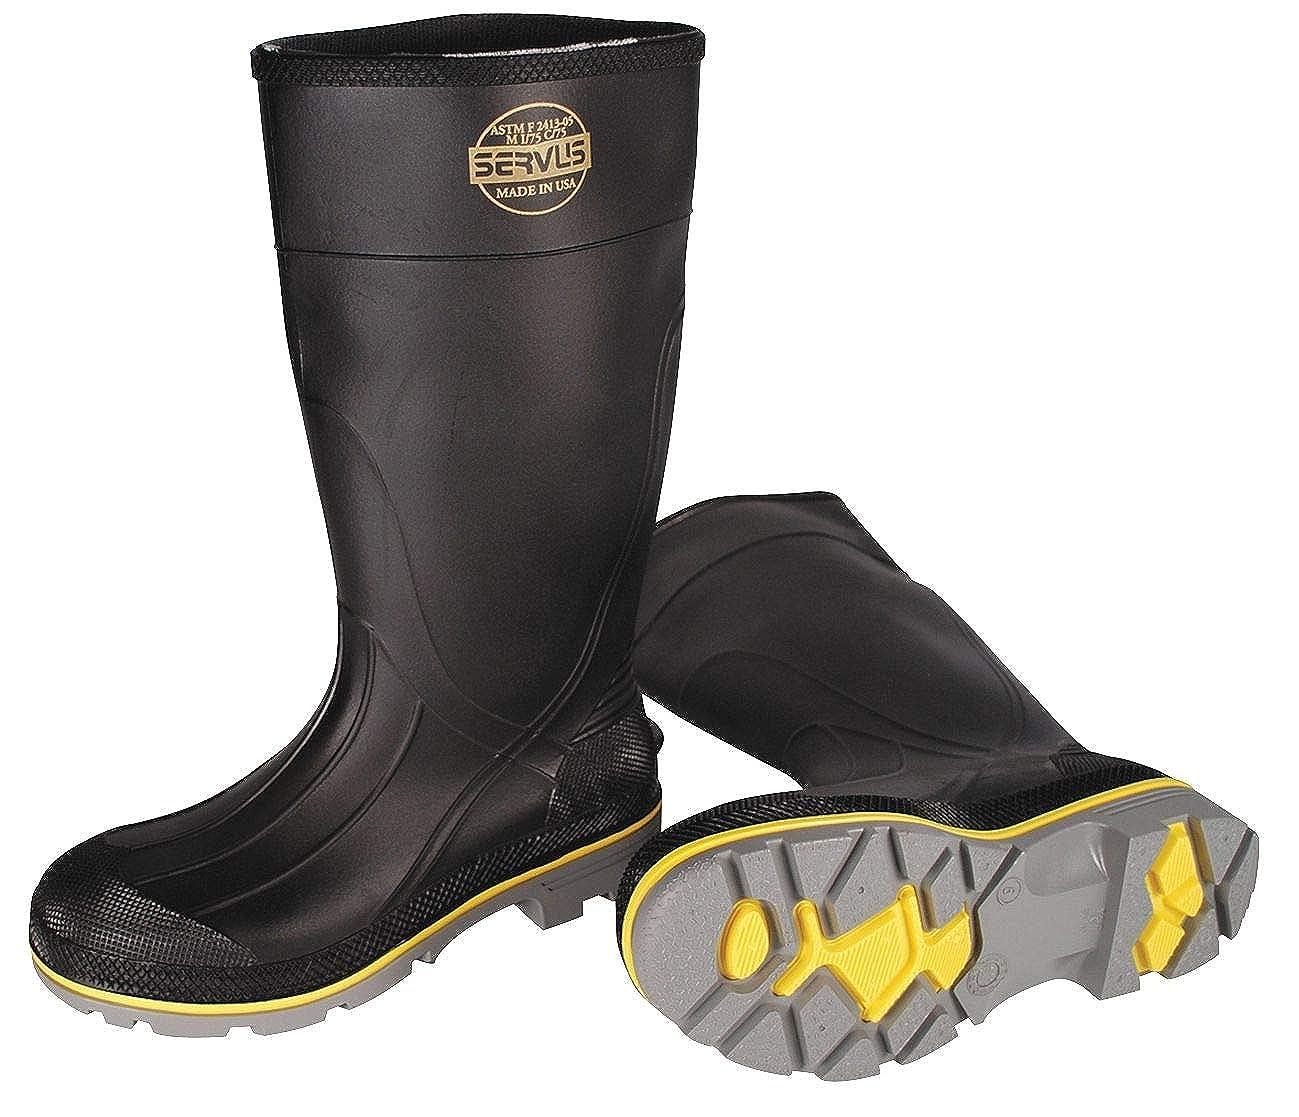 Size: 8 Steel Toe Type 15 Height 75109//8 PVC Upper Material Servus Mens Knee Boots